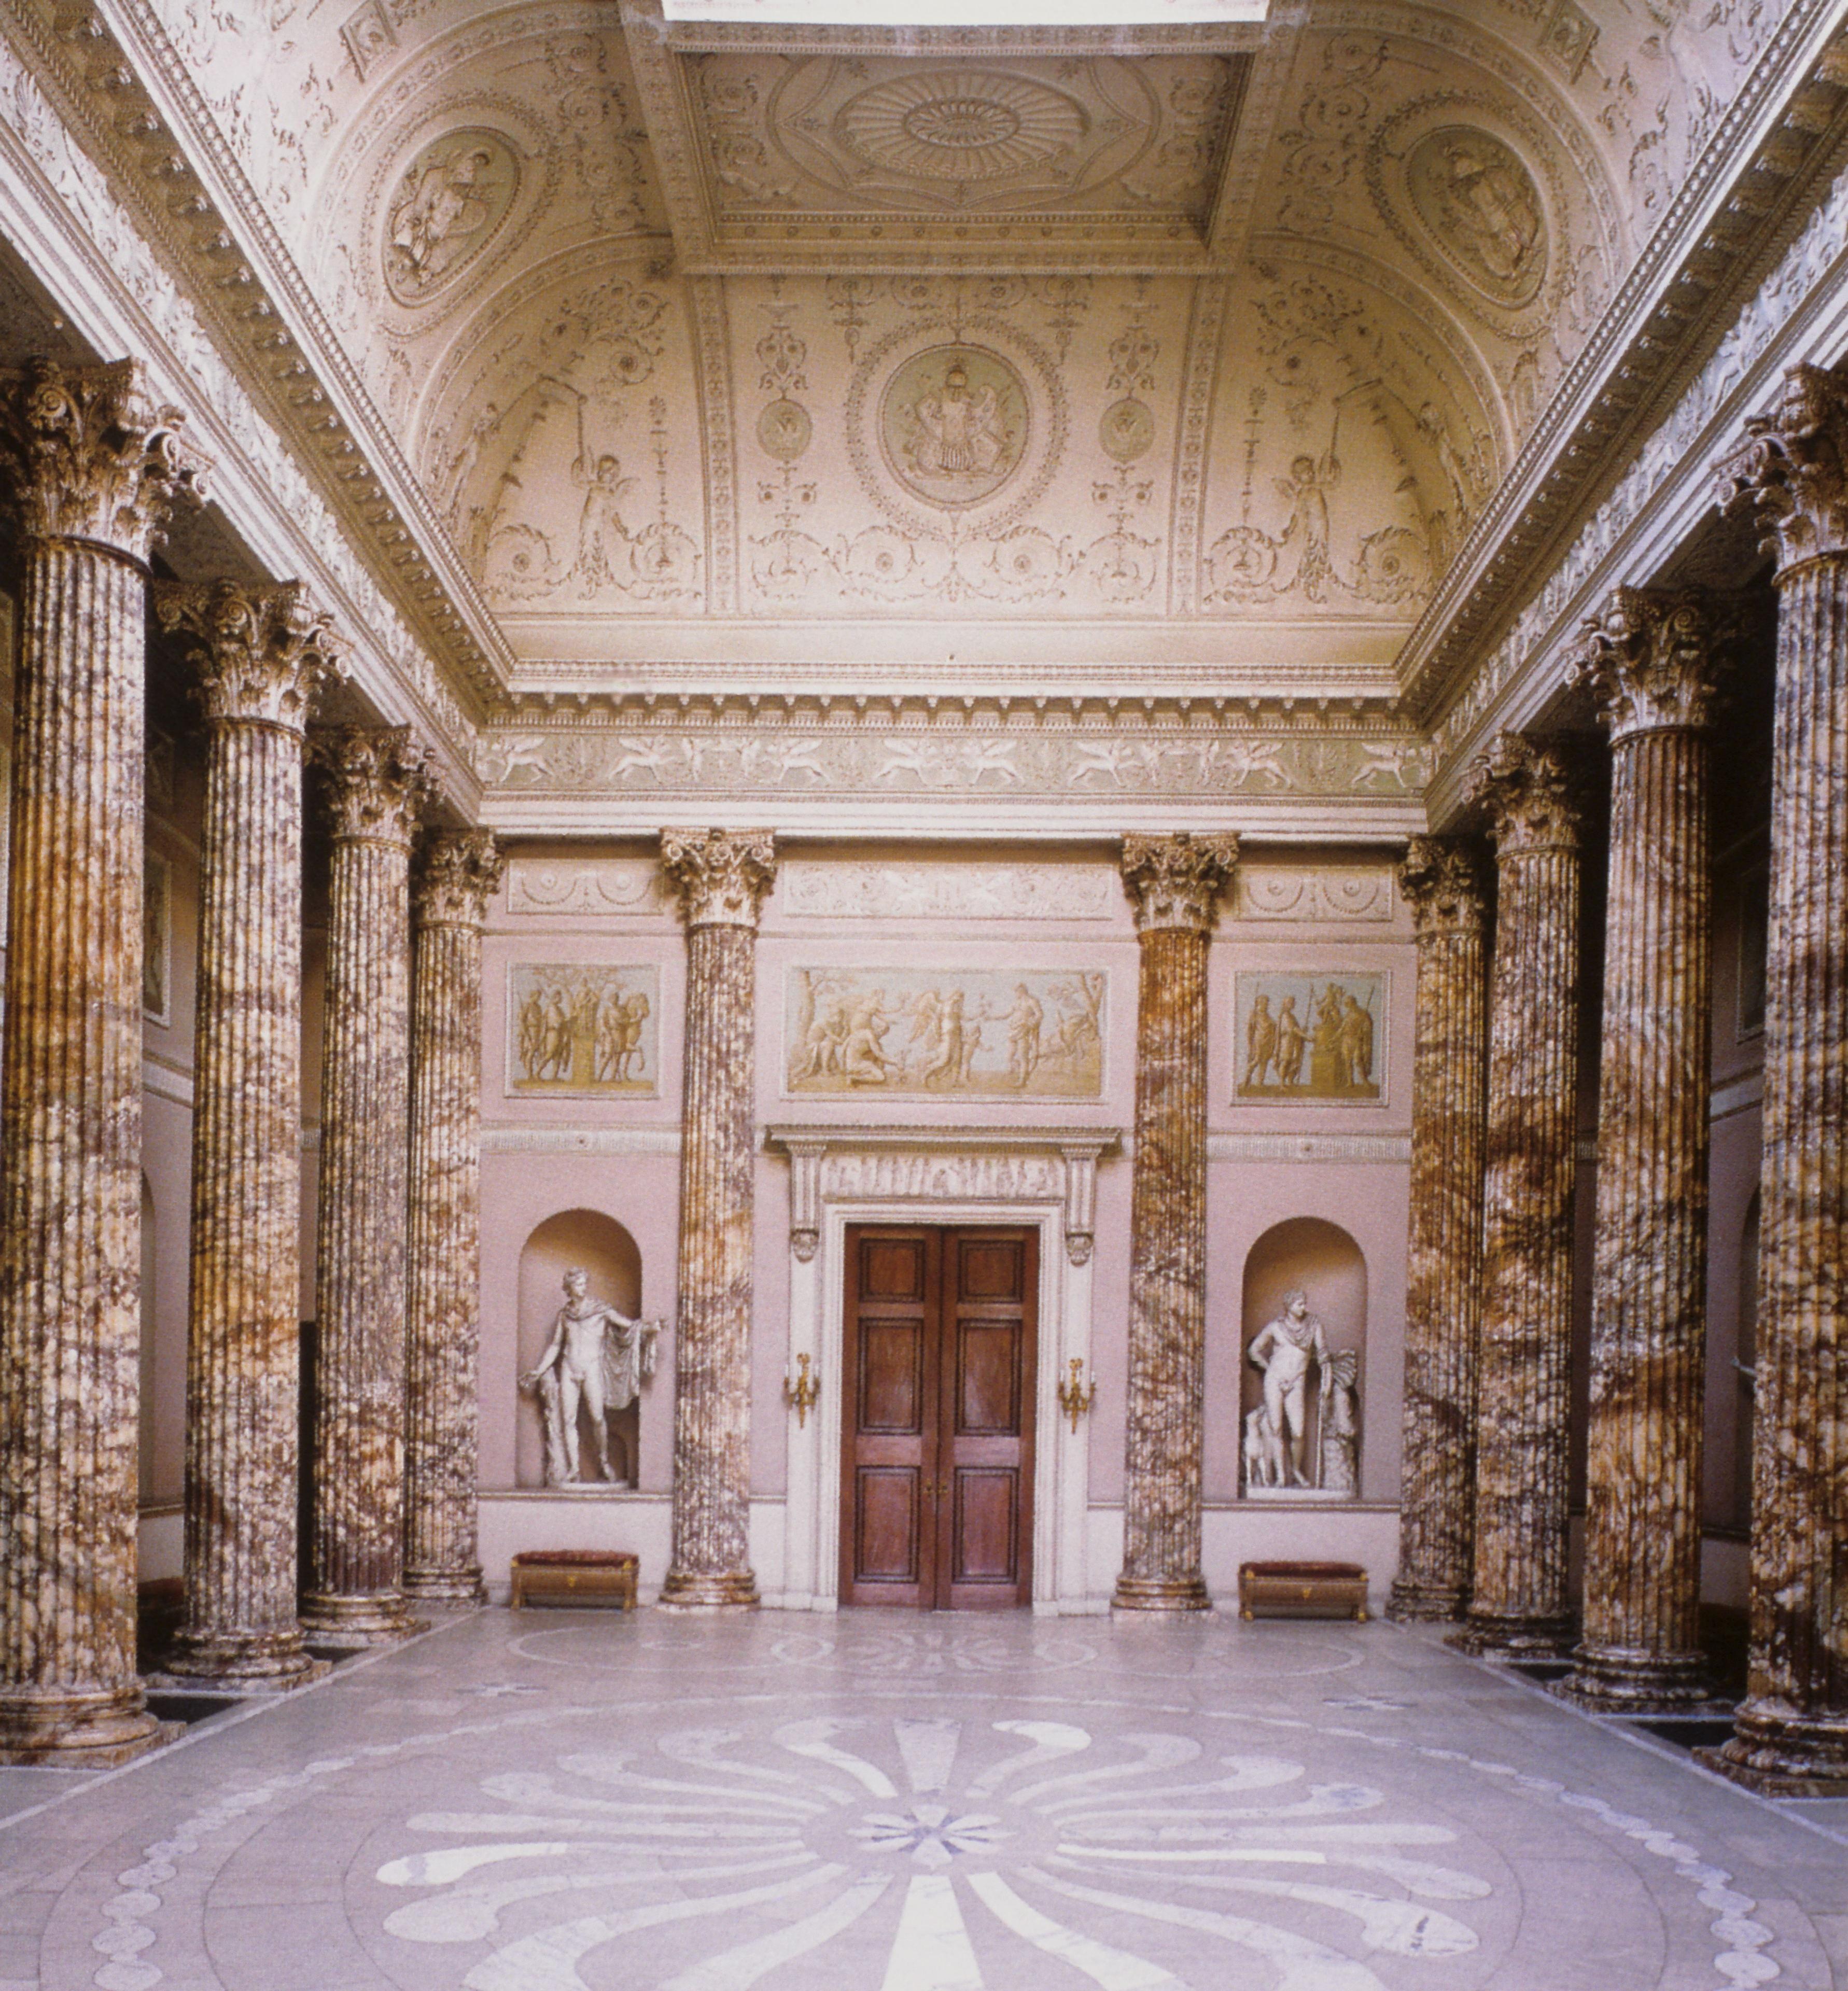 inspiring slides kedleston hall and its neoclassical